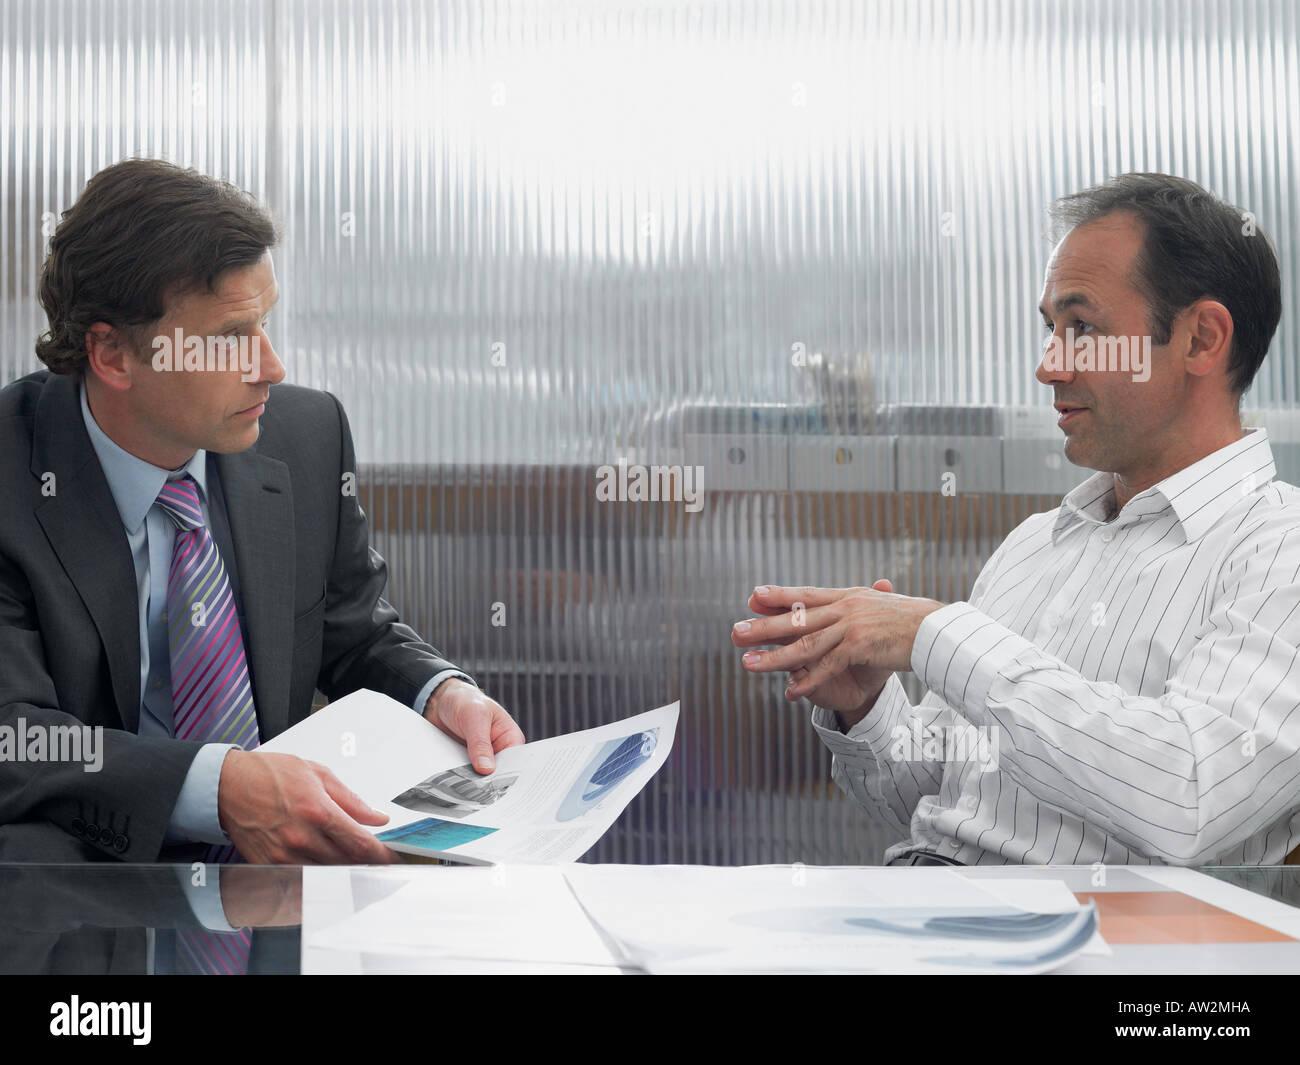 Buisnessmen in discussion - Stock Image